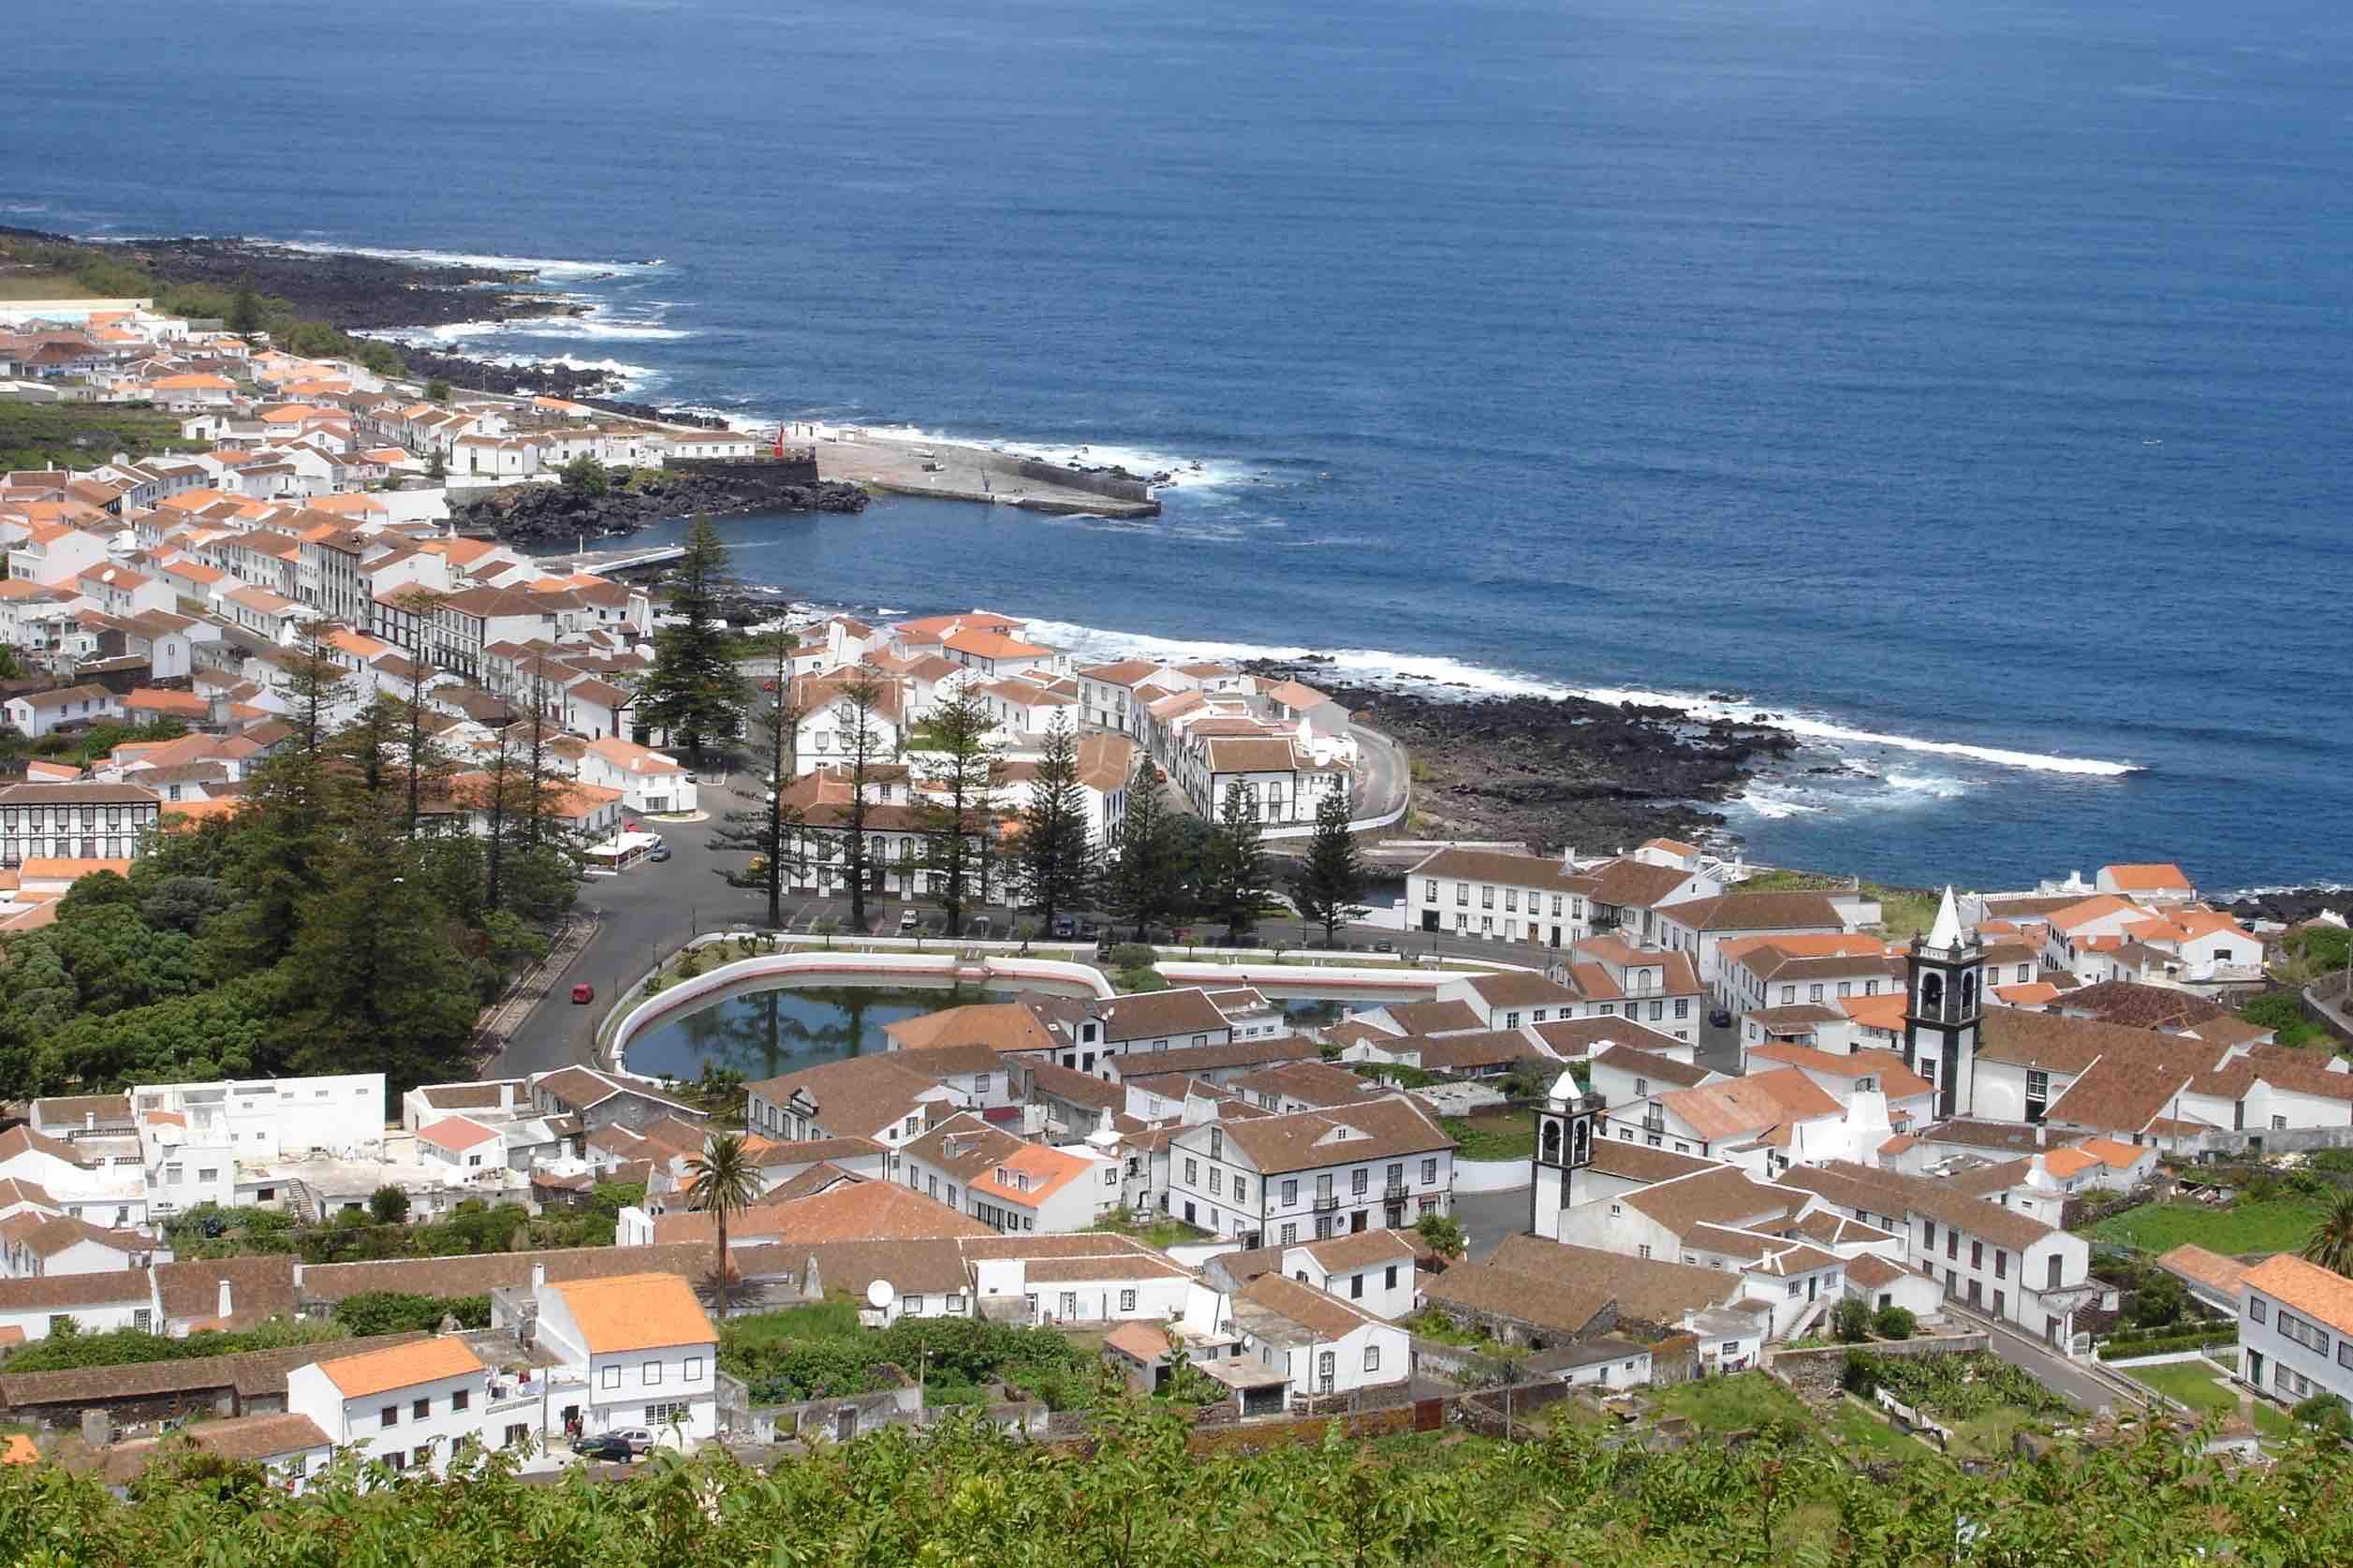 Graciosa / Azoren - Anwesen mit traumhaftem Meerblick